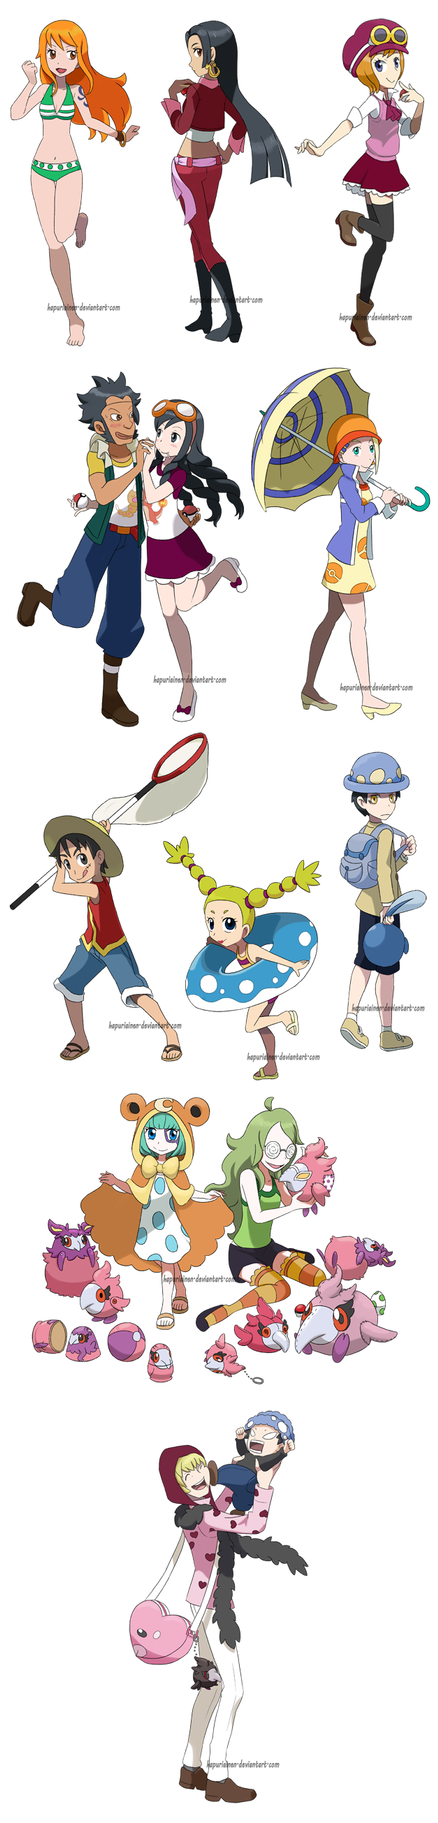 One Piece Poketrainers by Hapuriainen